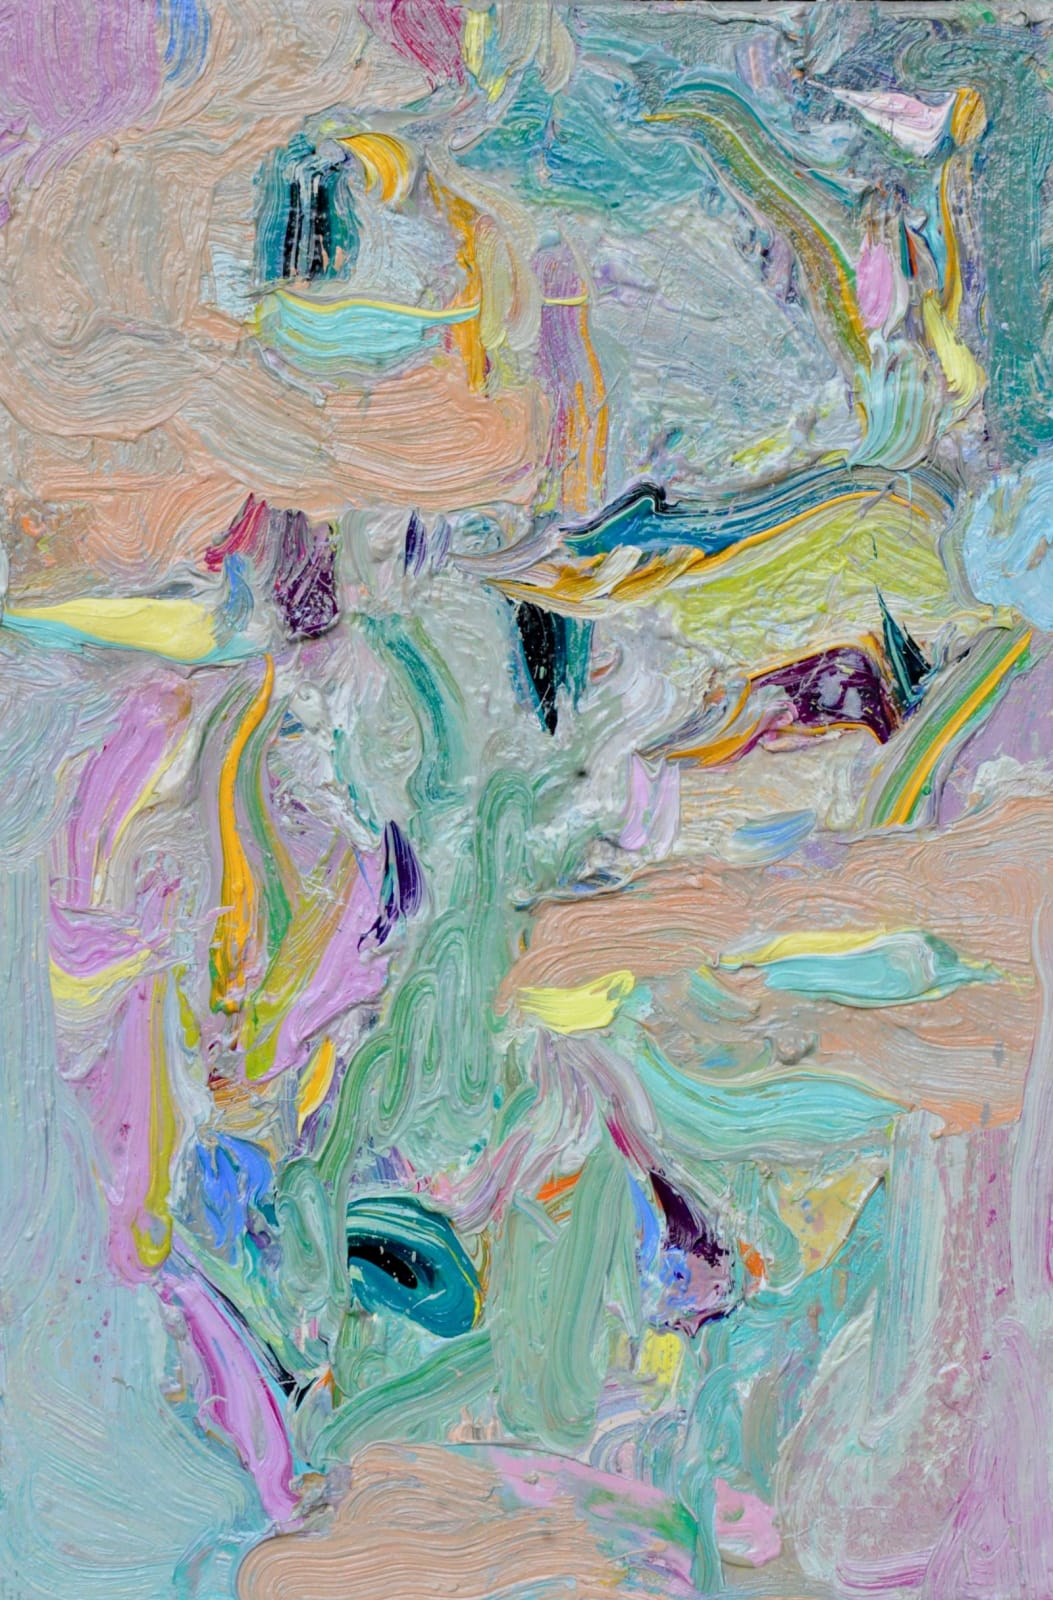 Art Rotterdam 2019, David Bade, Marc Mulders, Kim Dorland,